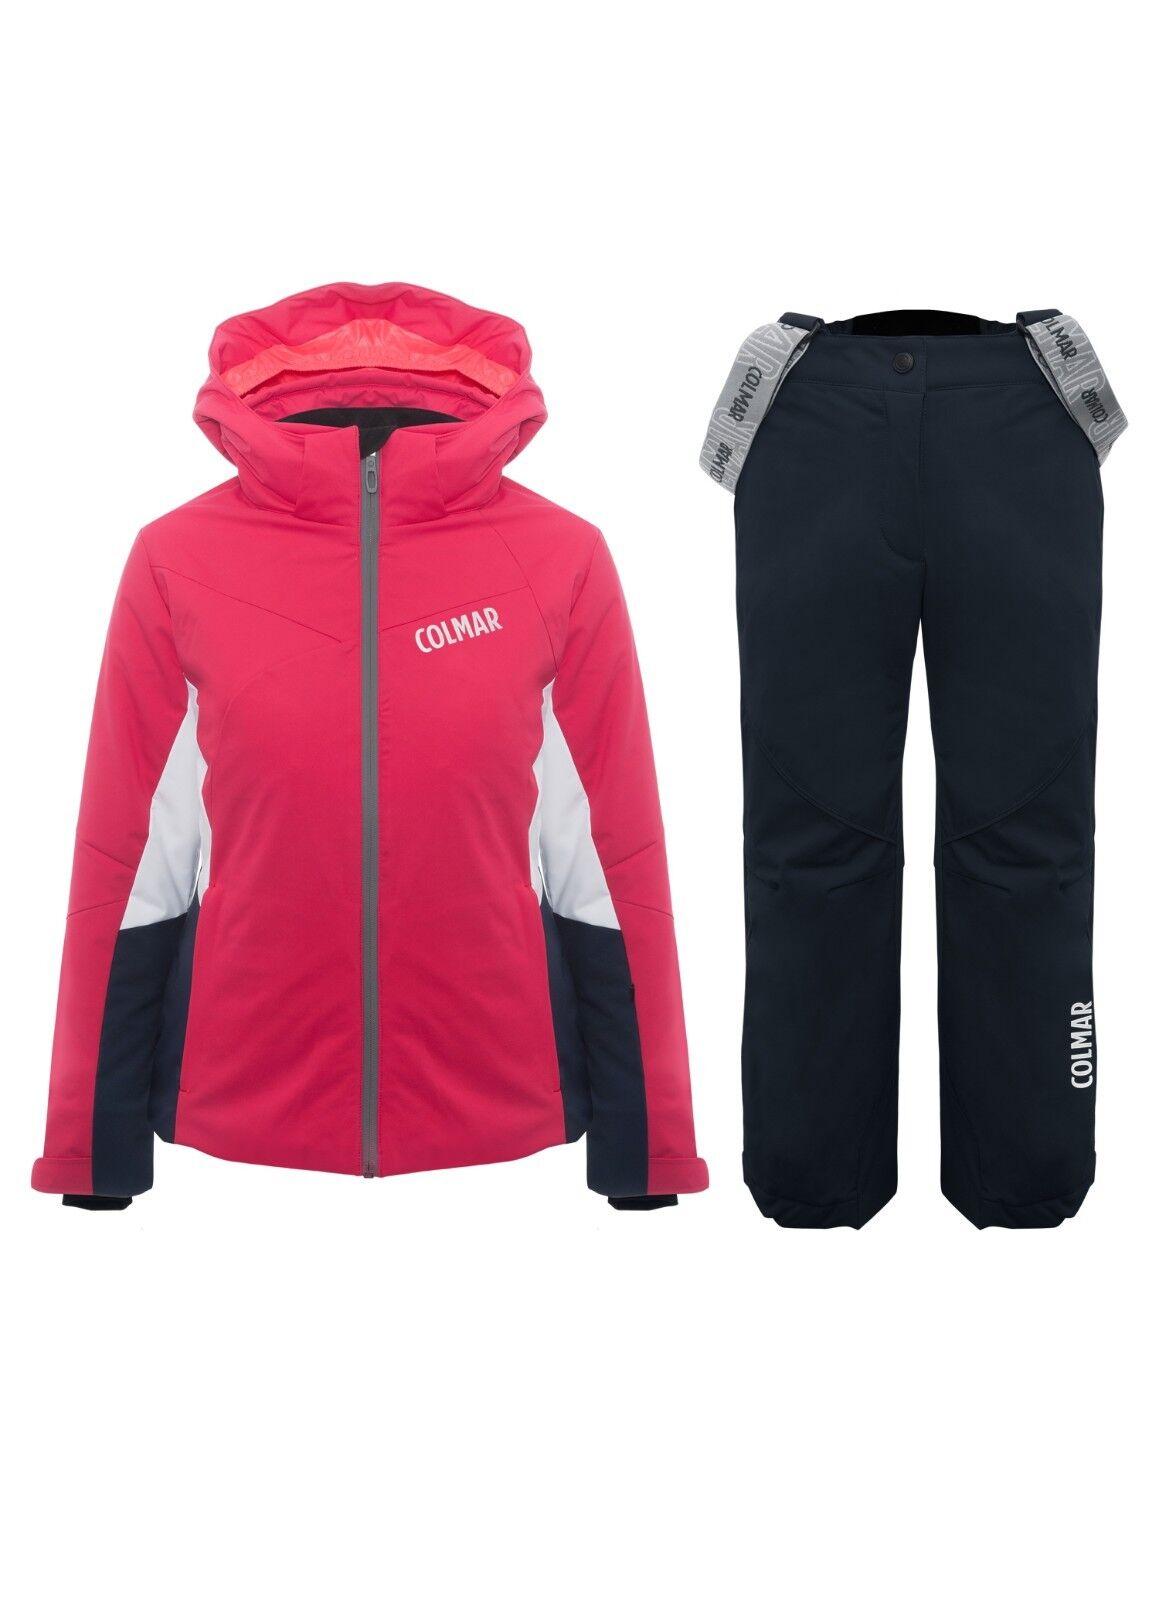 Completo neve bambina colmar sci jr giacca + pantalone mod 3123c - 3123s col 124